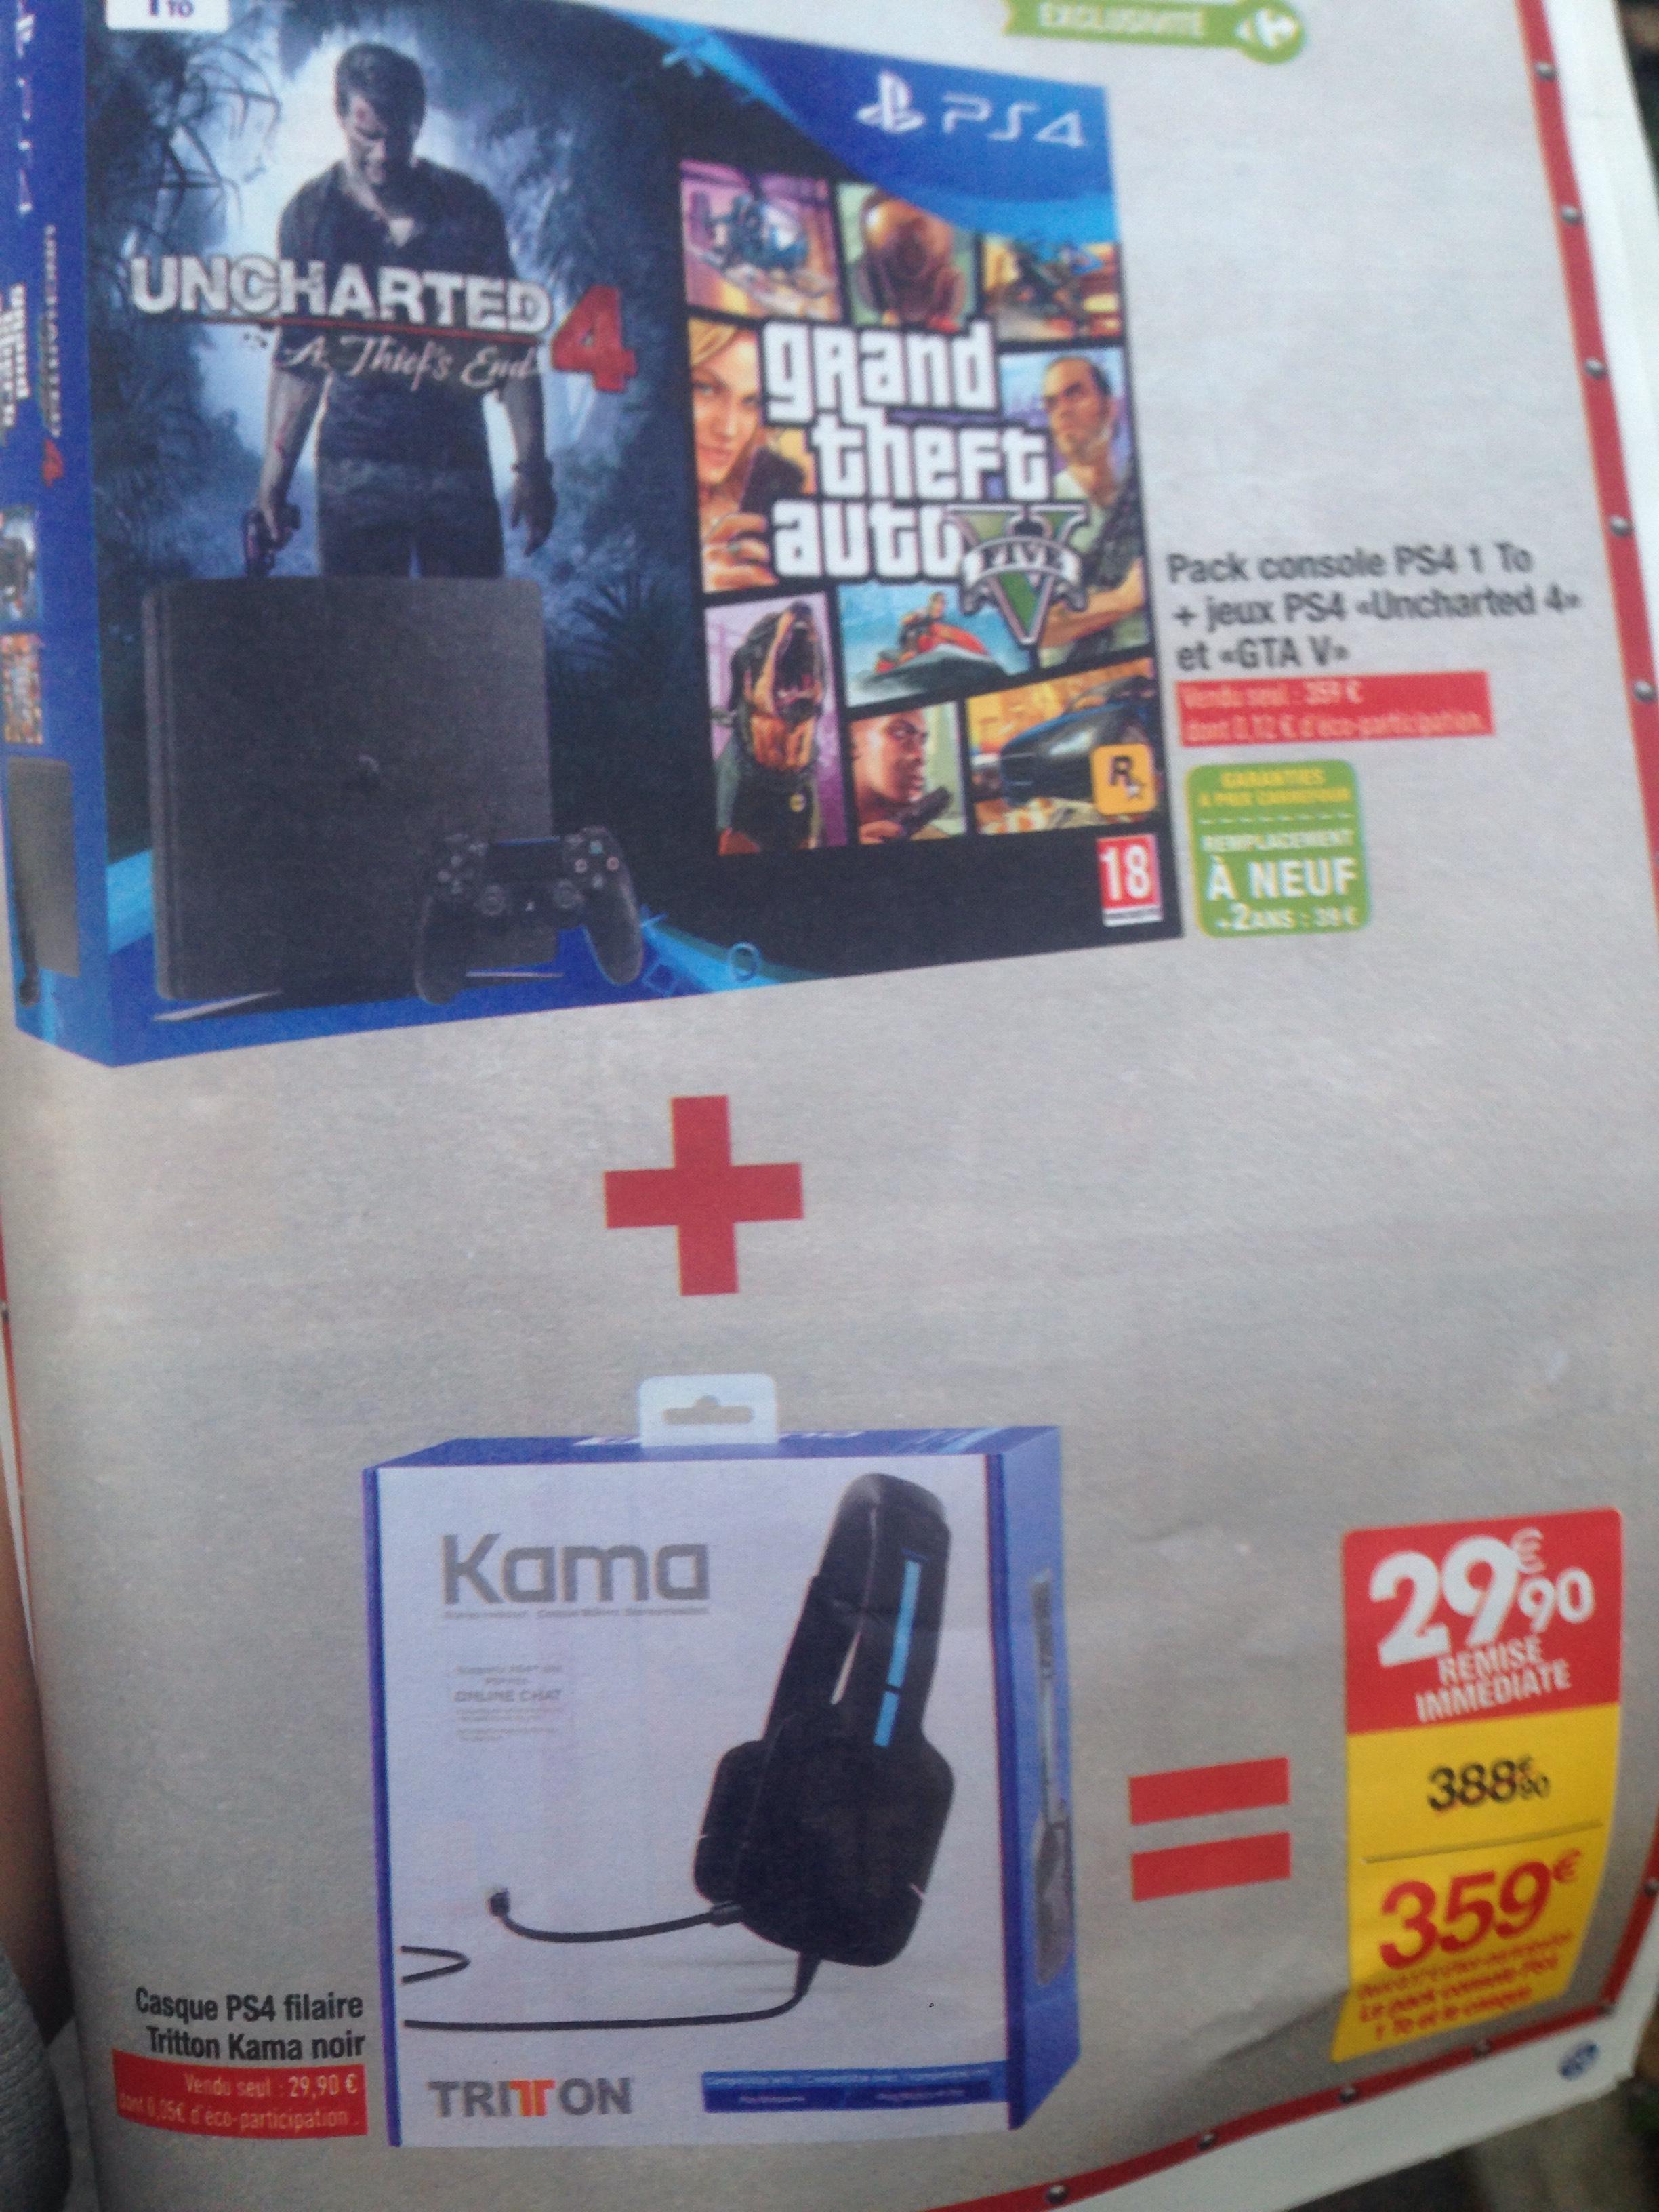 Console PS4 Slim 1 To + GTA 5 + Uncharted 4 + Casque Triton Kama